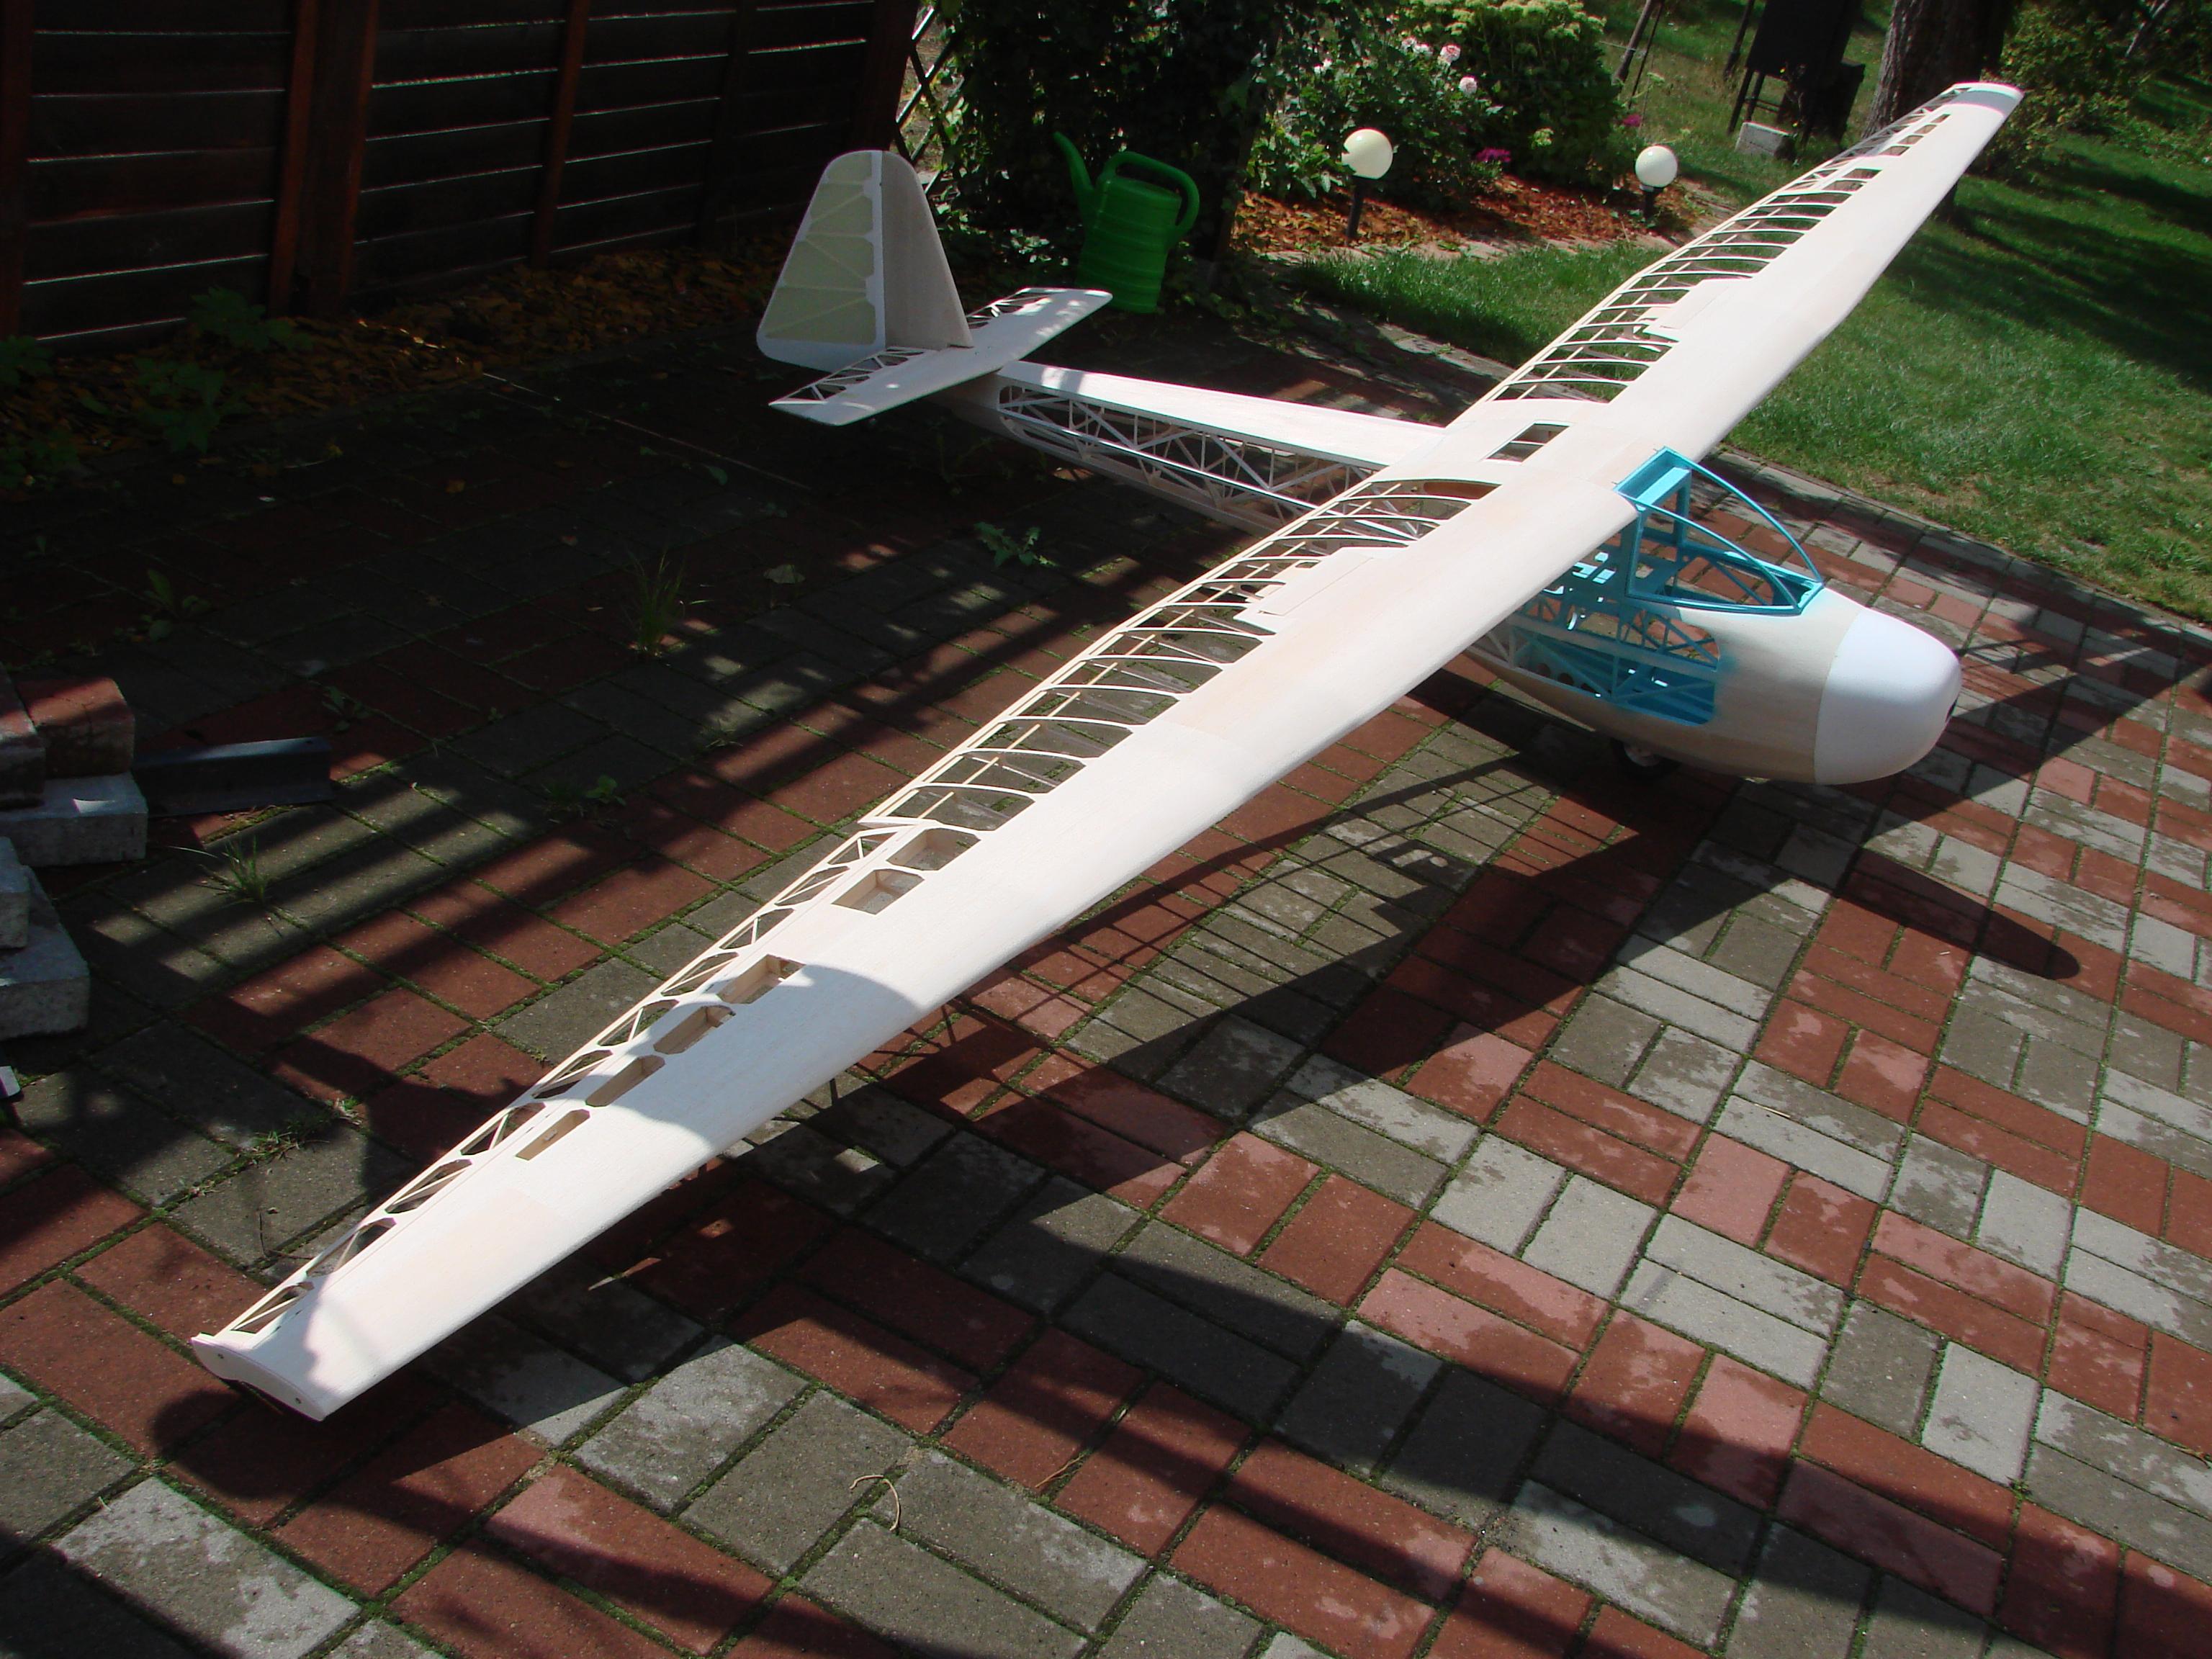 SF-24